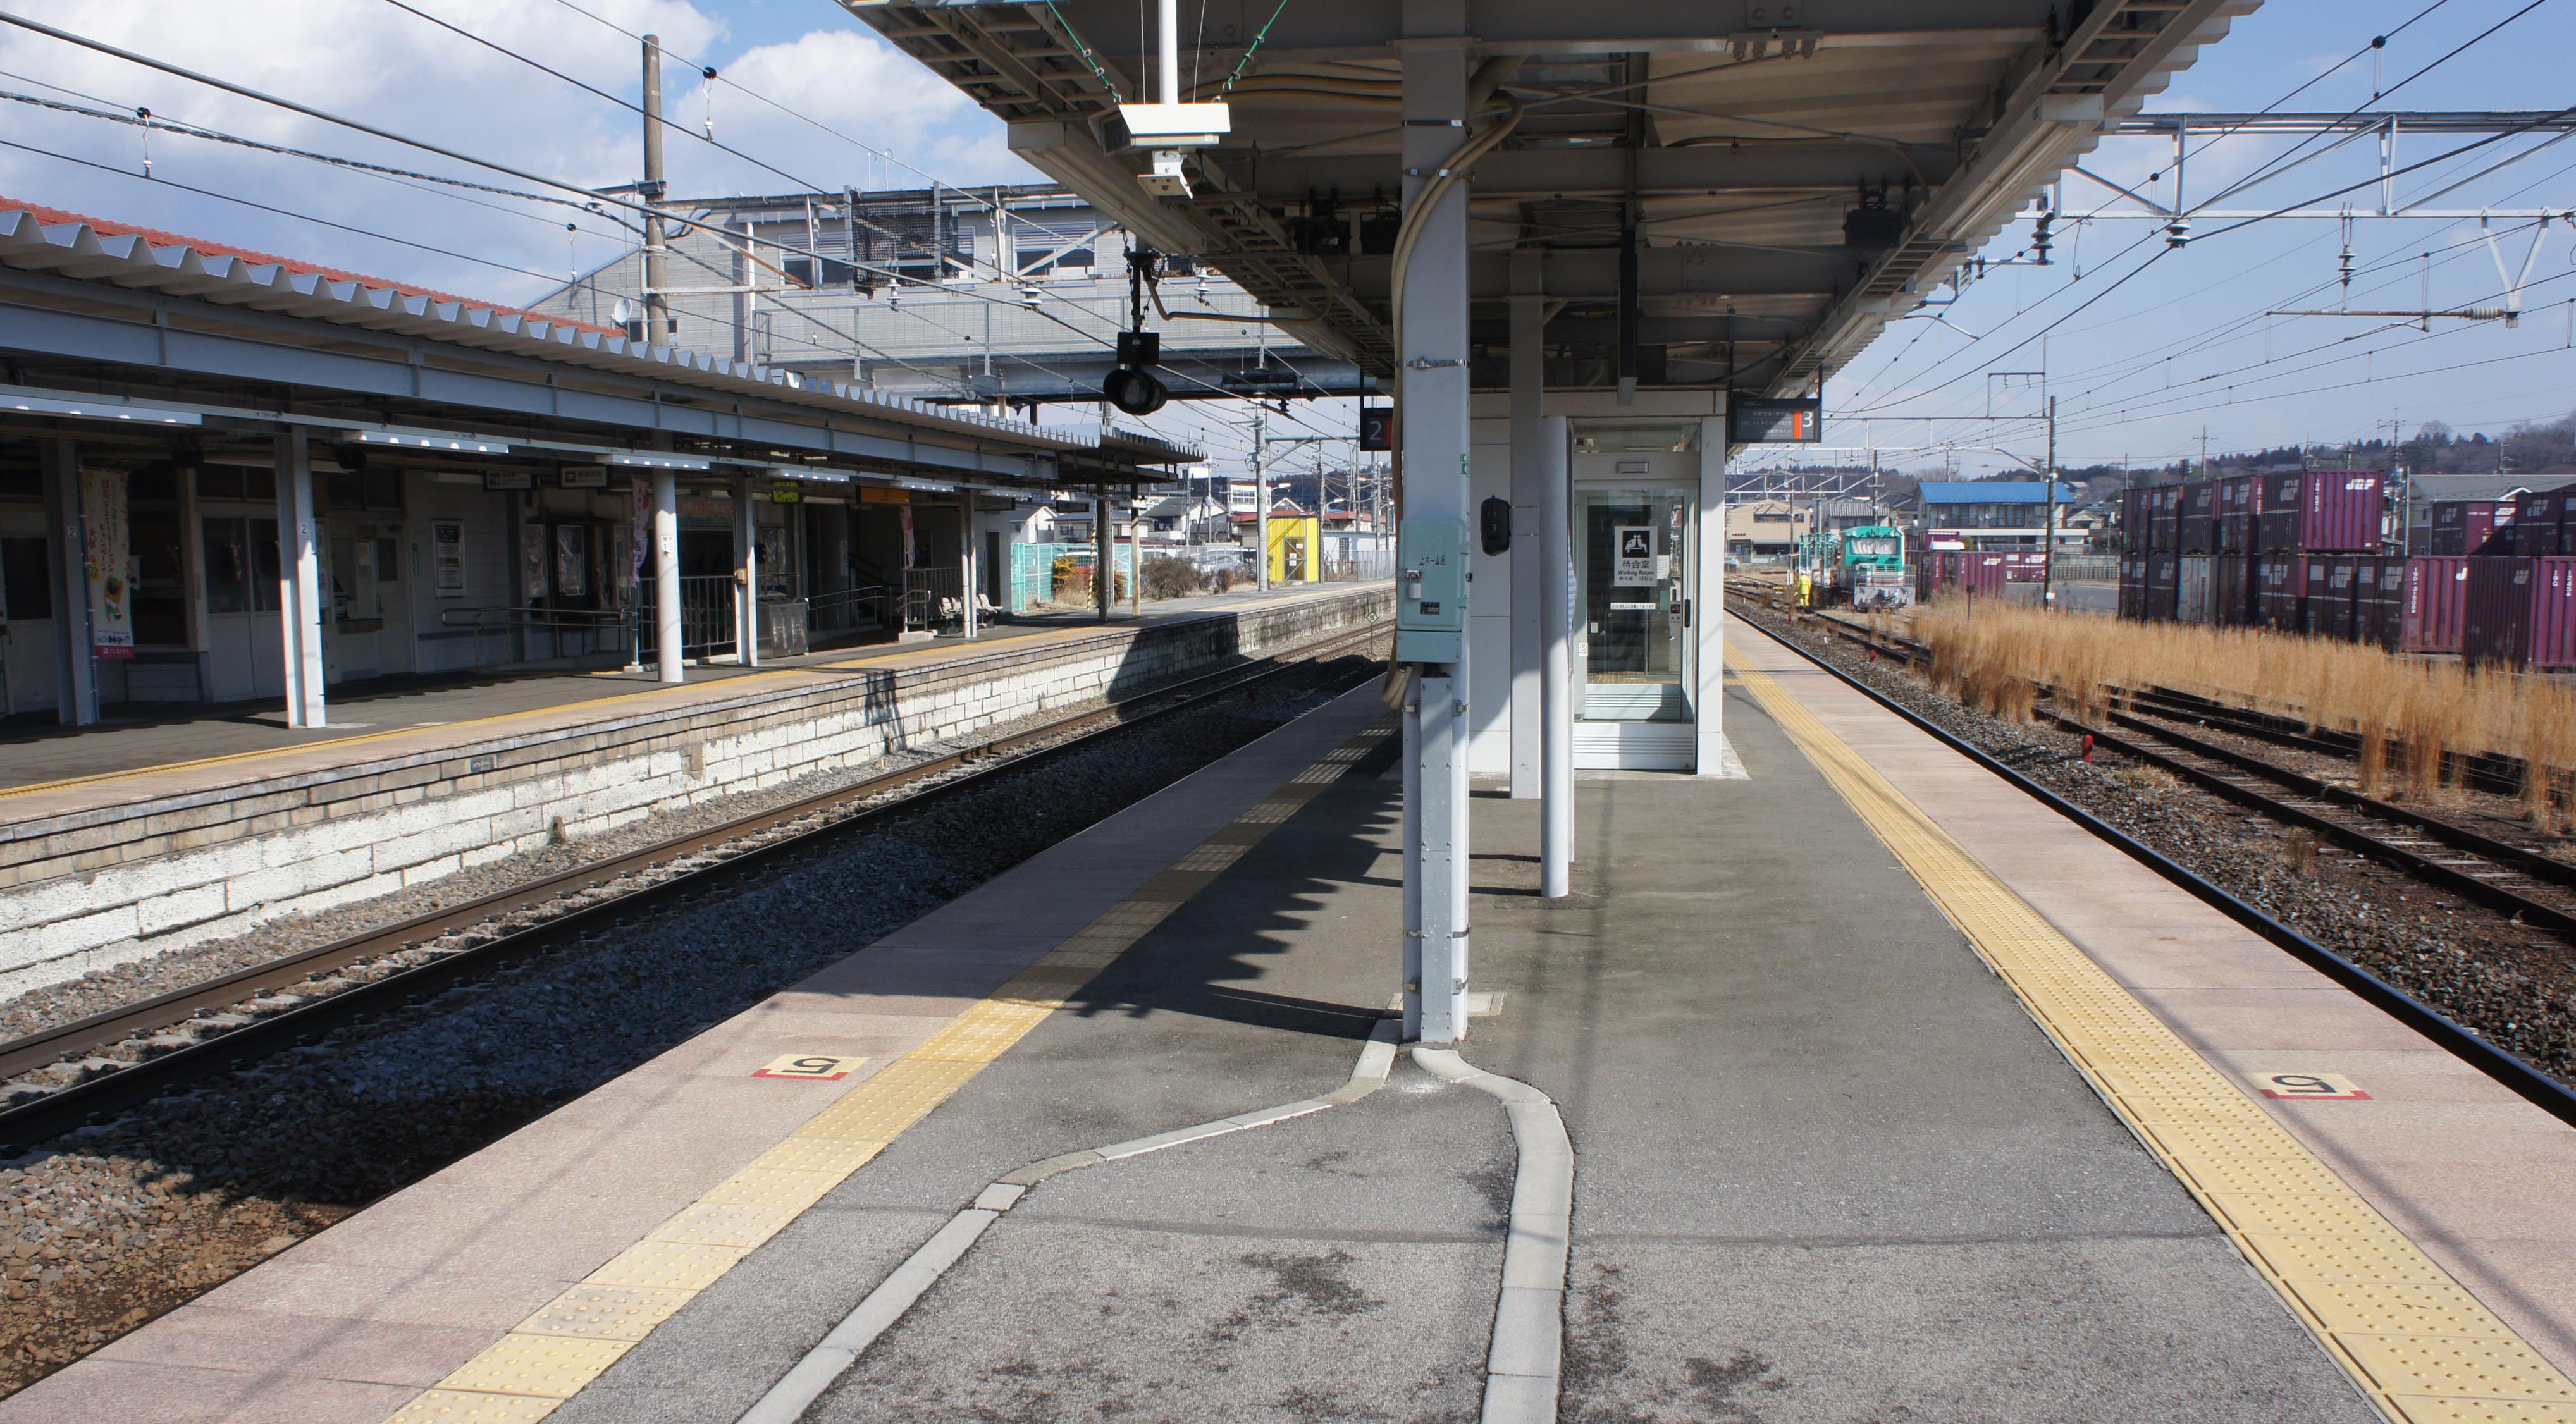 https://upload.wikimedia.org/wikipedia/commons/3/30/JR_Tohoku-Main-Line_Yaita_Station_Platform.jpg